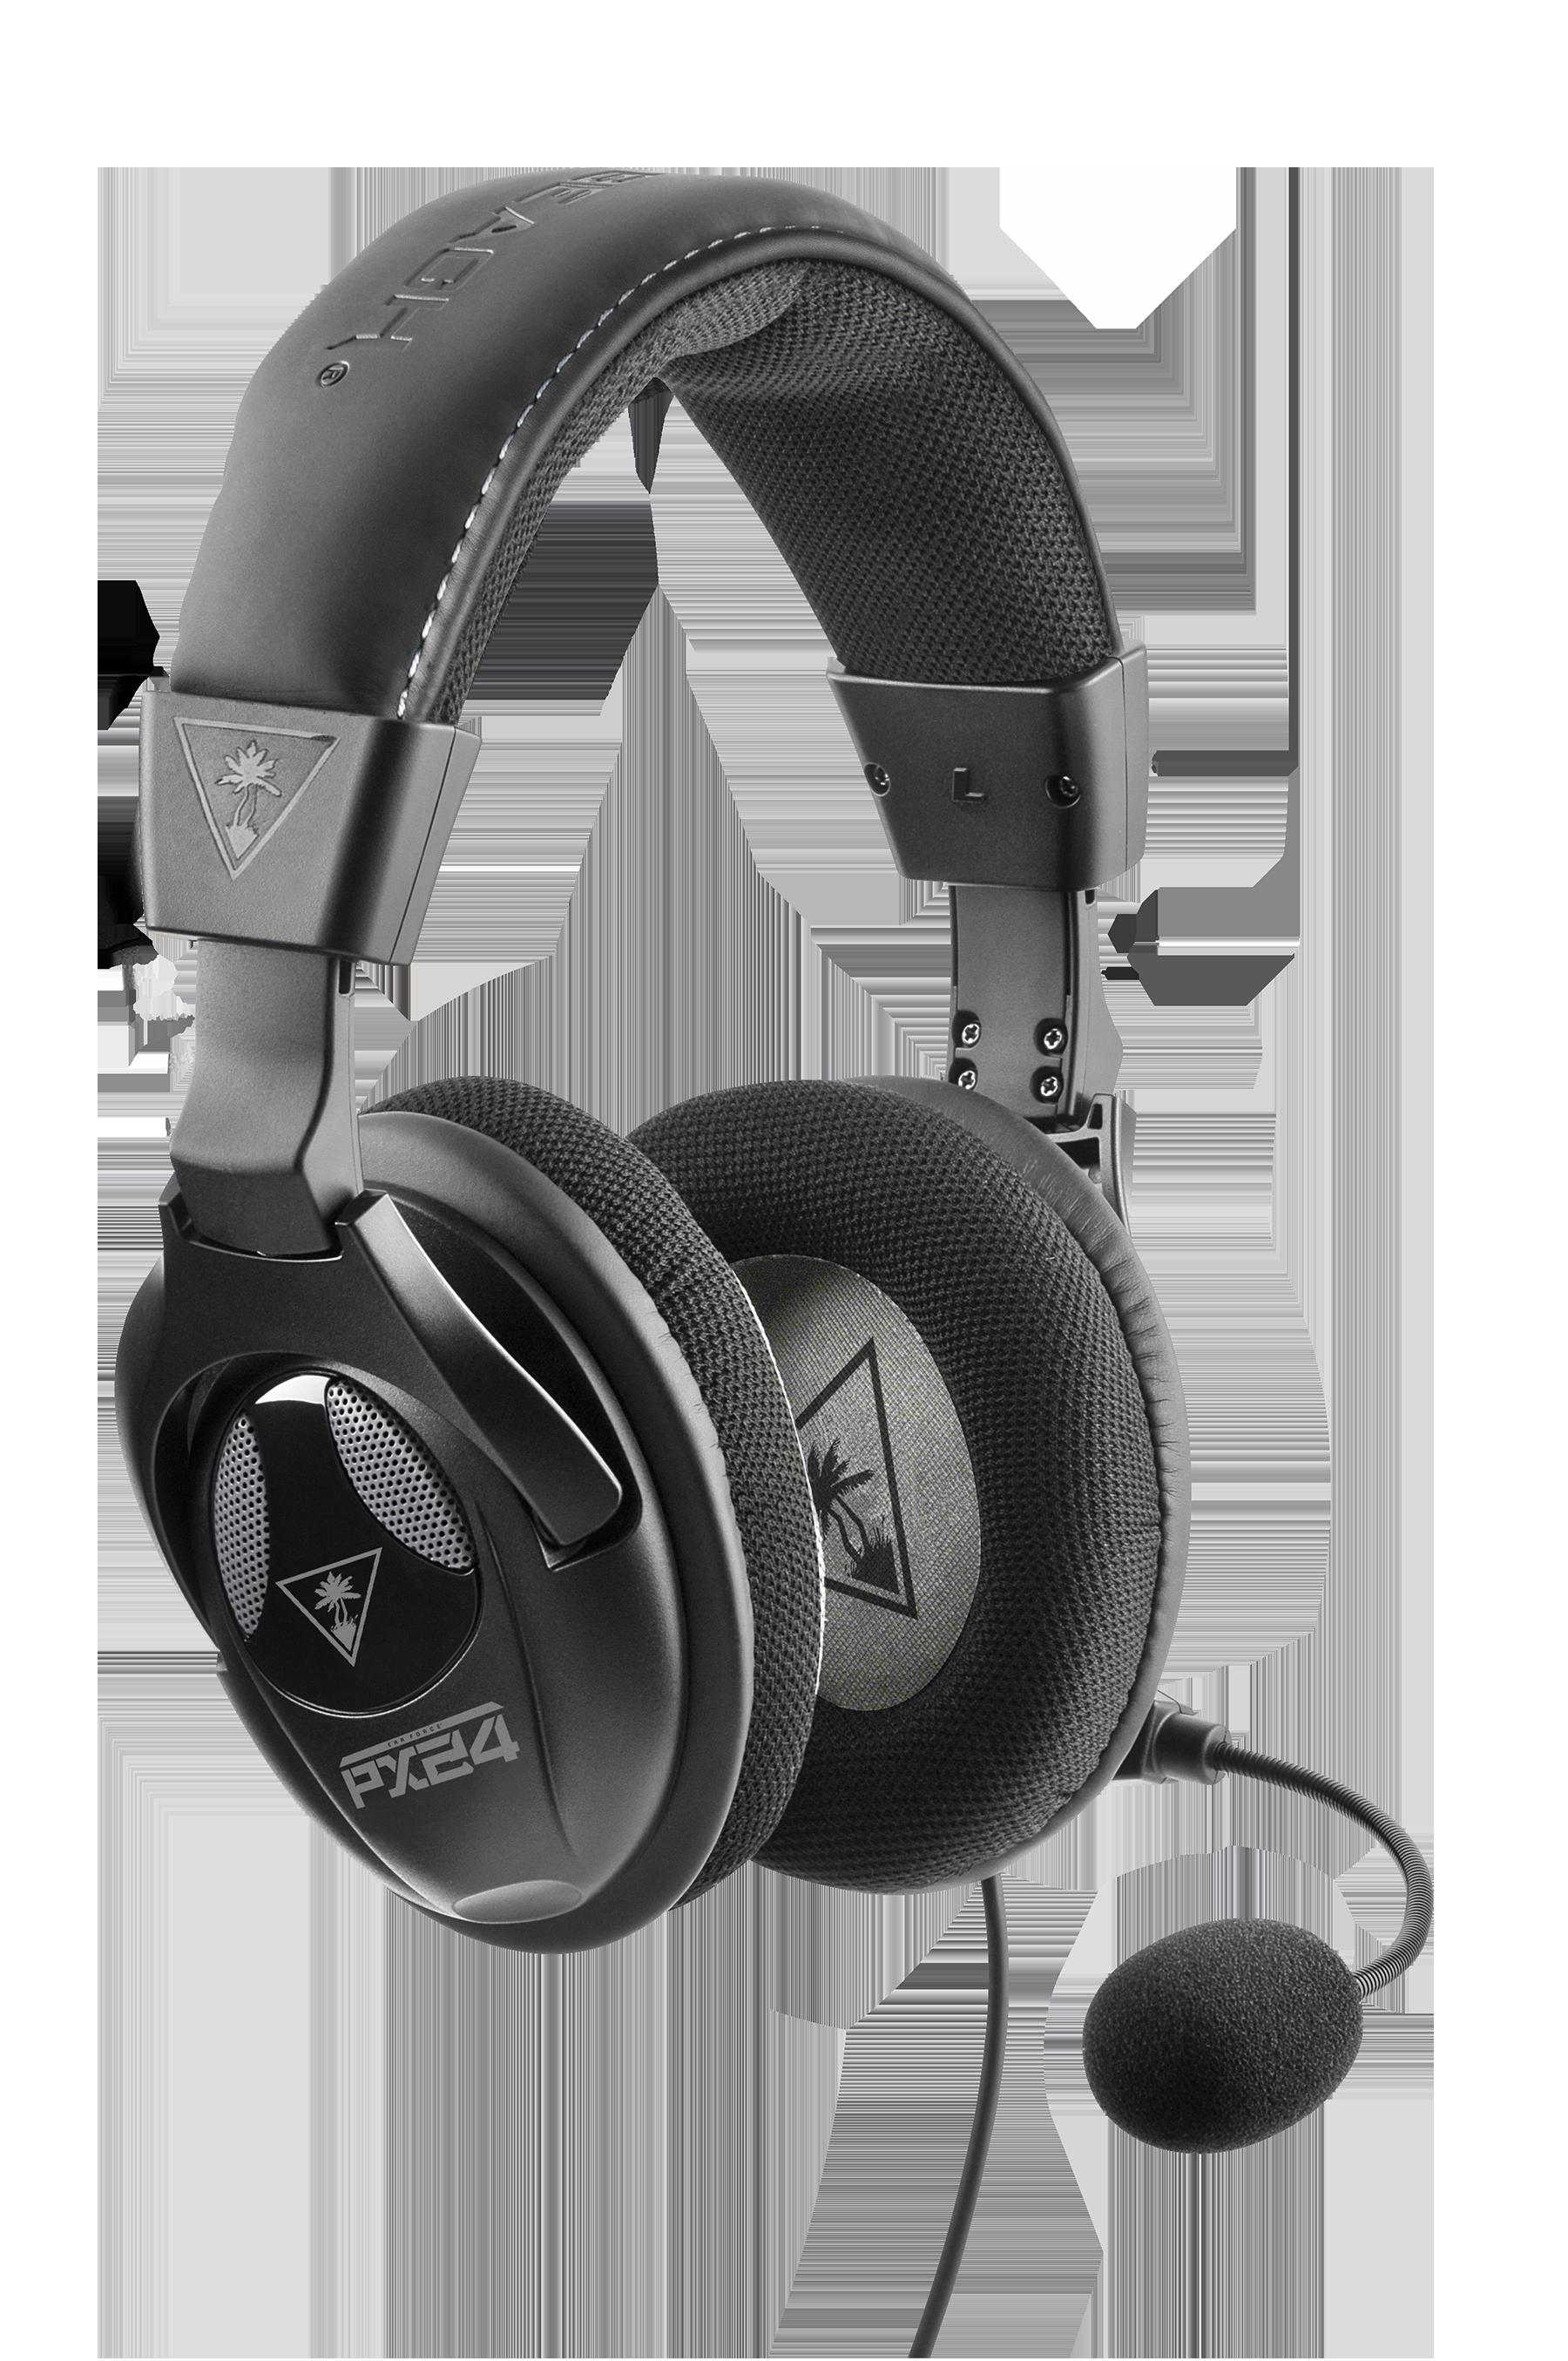 Amazon com: Turtle Beach - Ear Force PX24 Multi-platform